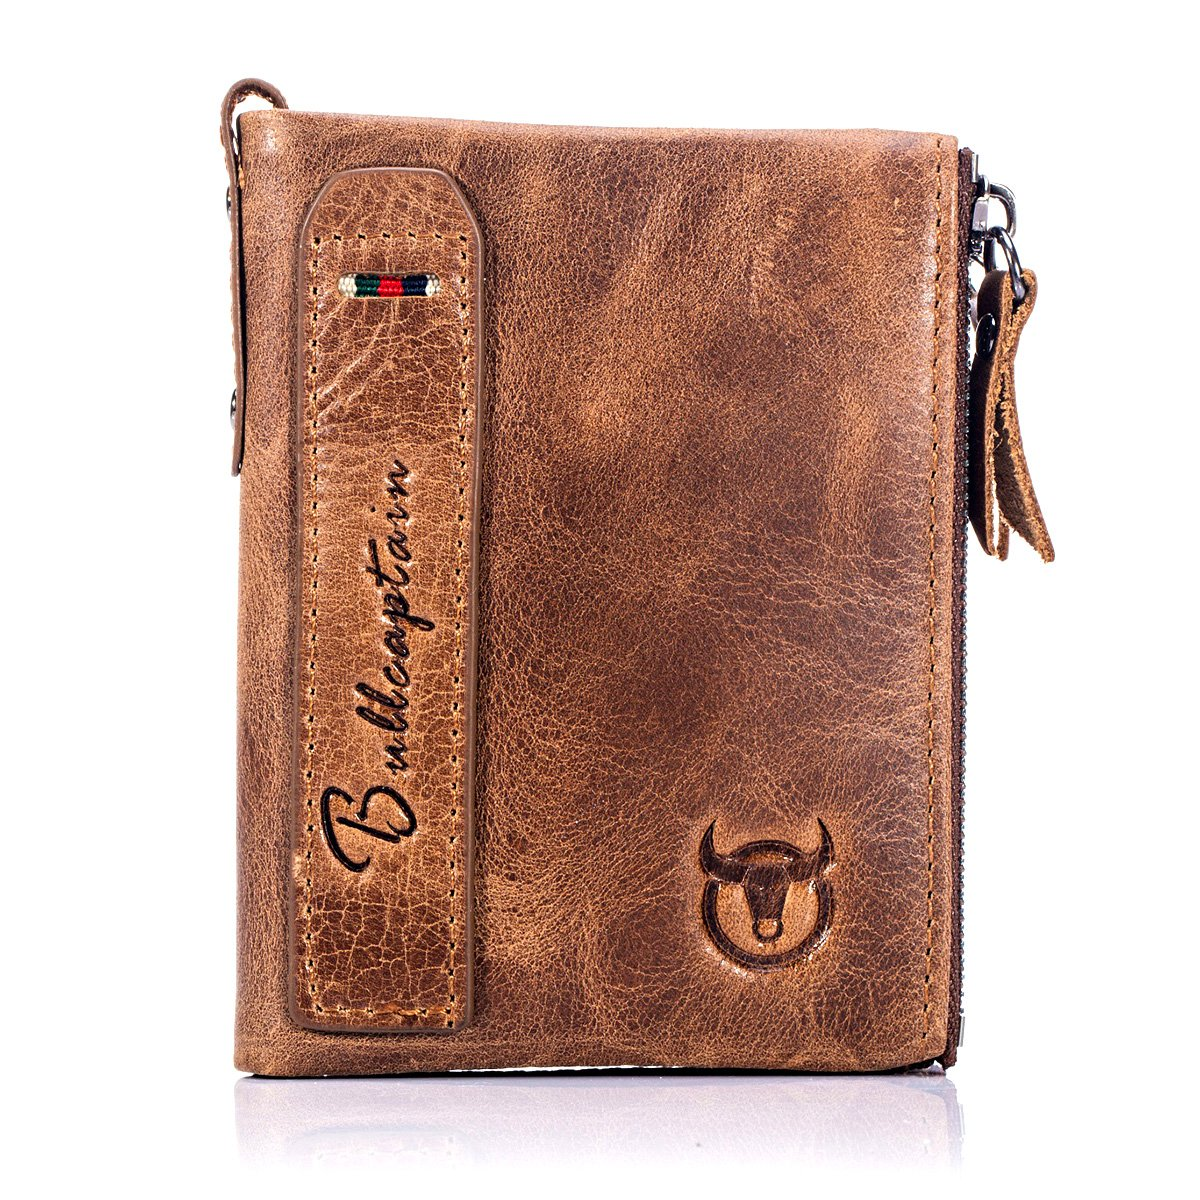 8c7d96ccc BULLCAPTAIN Wallets for Men with Double Zip Coin Purse Bifold Vintage  Genuine Leather Front Pocket Wallet QB-6